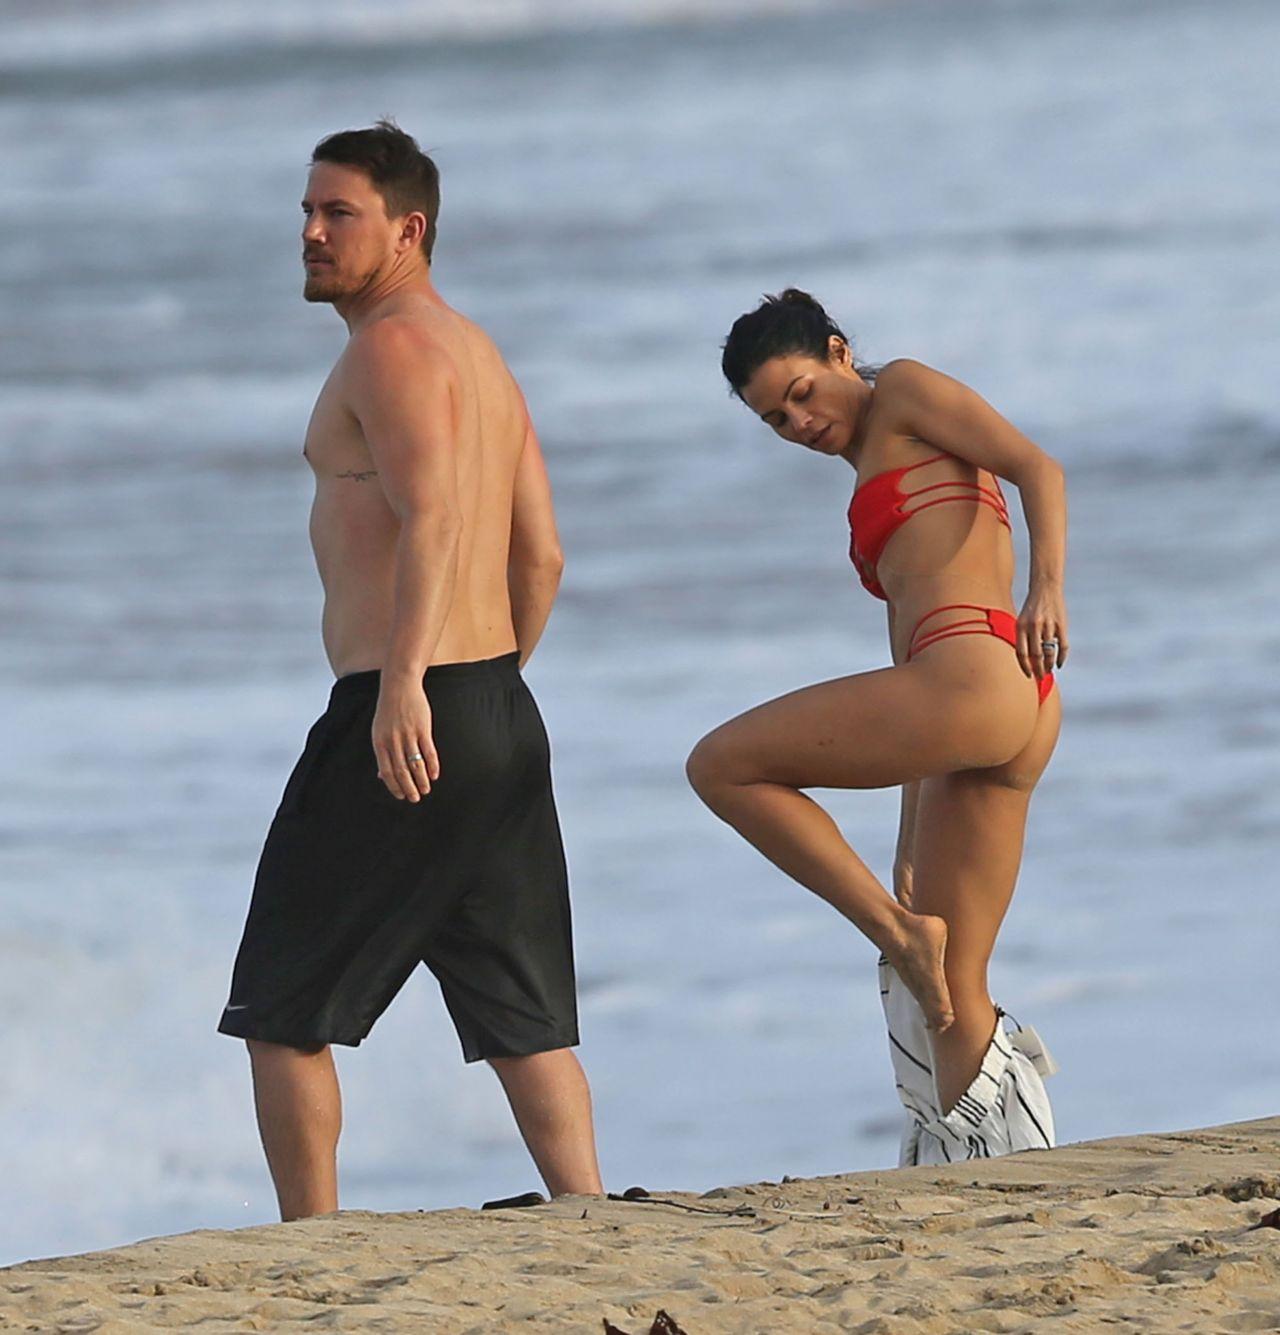 Jenna Dewan in Red Bikini - Beach Fun in Hawaii, February 2017 ченнинг татум 2019